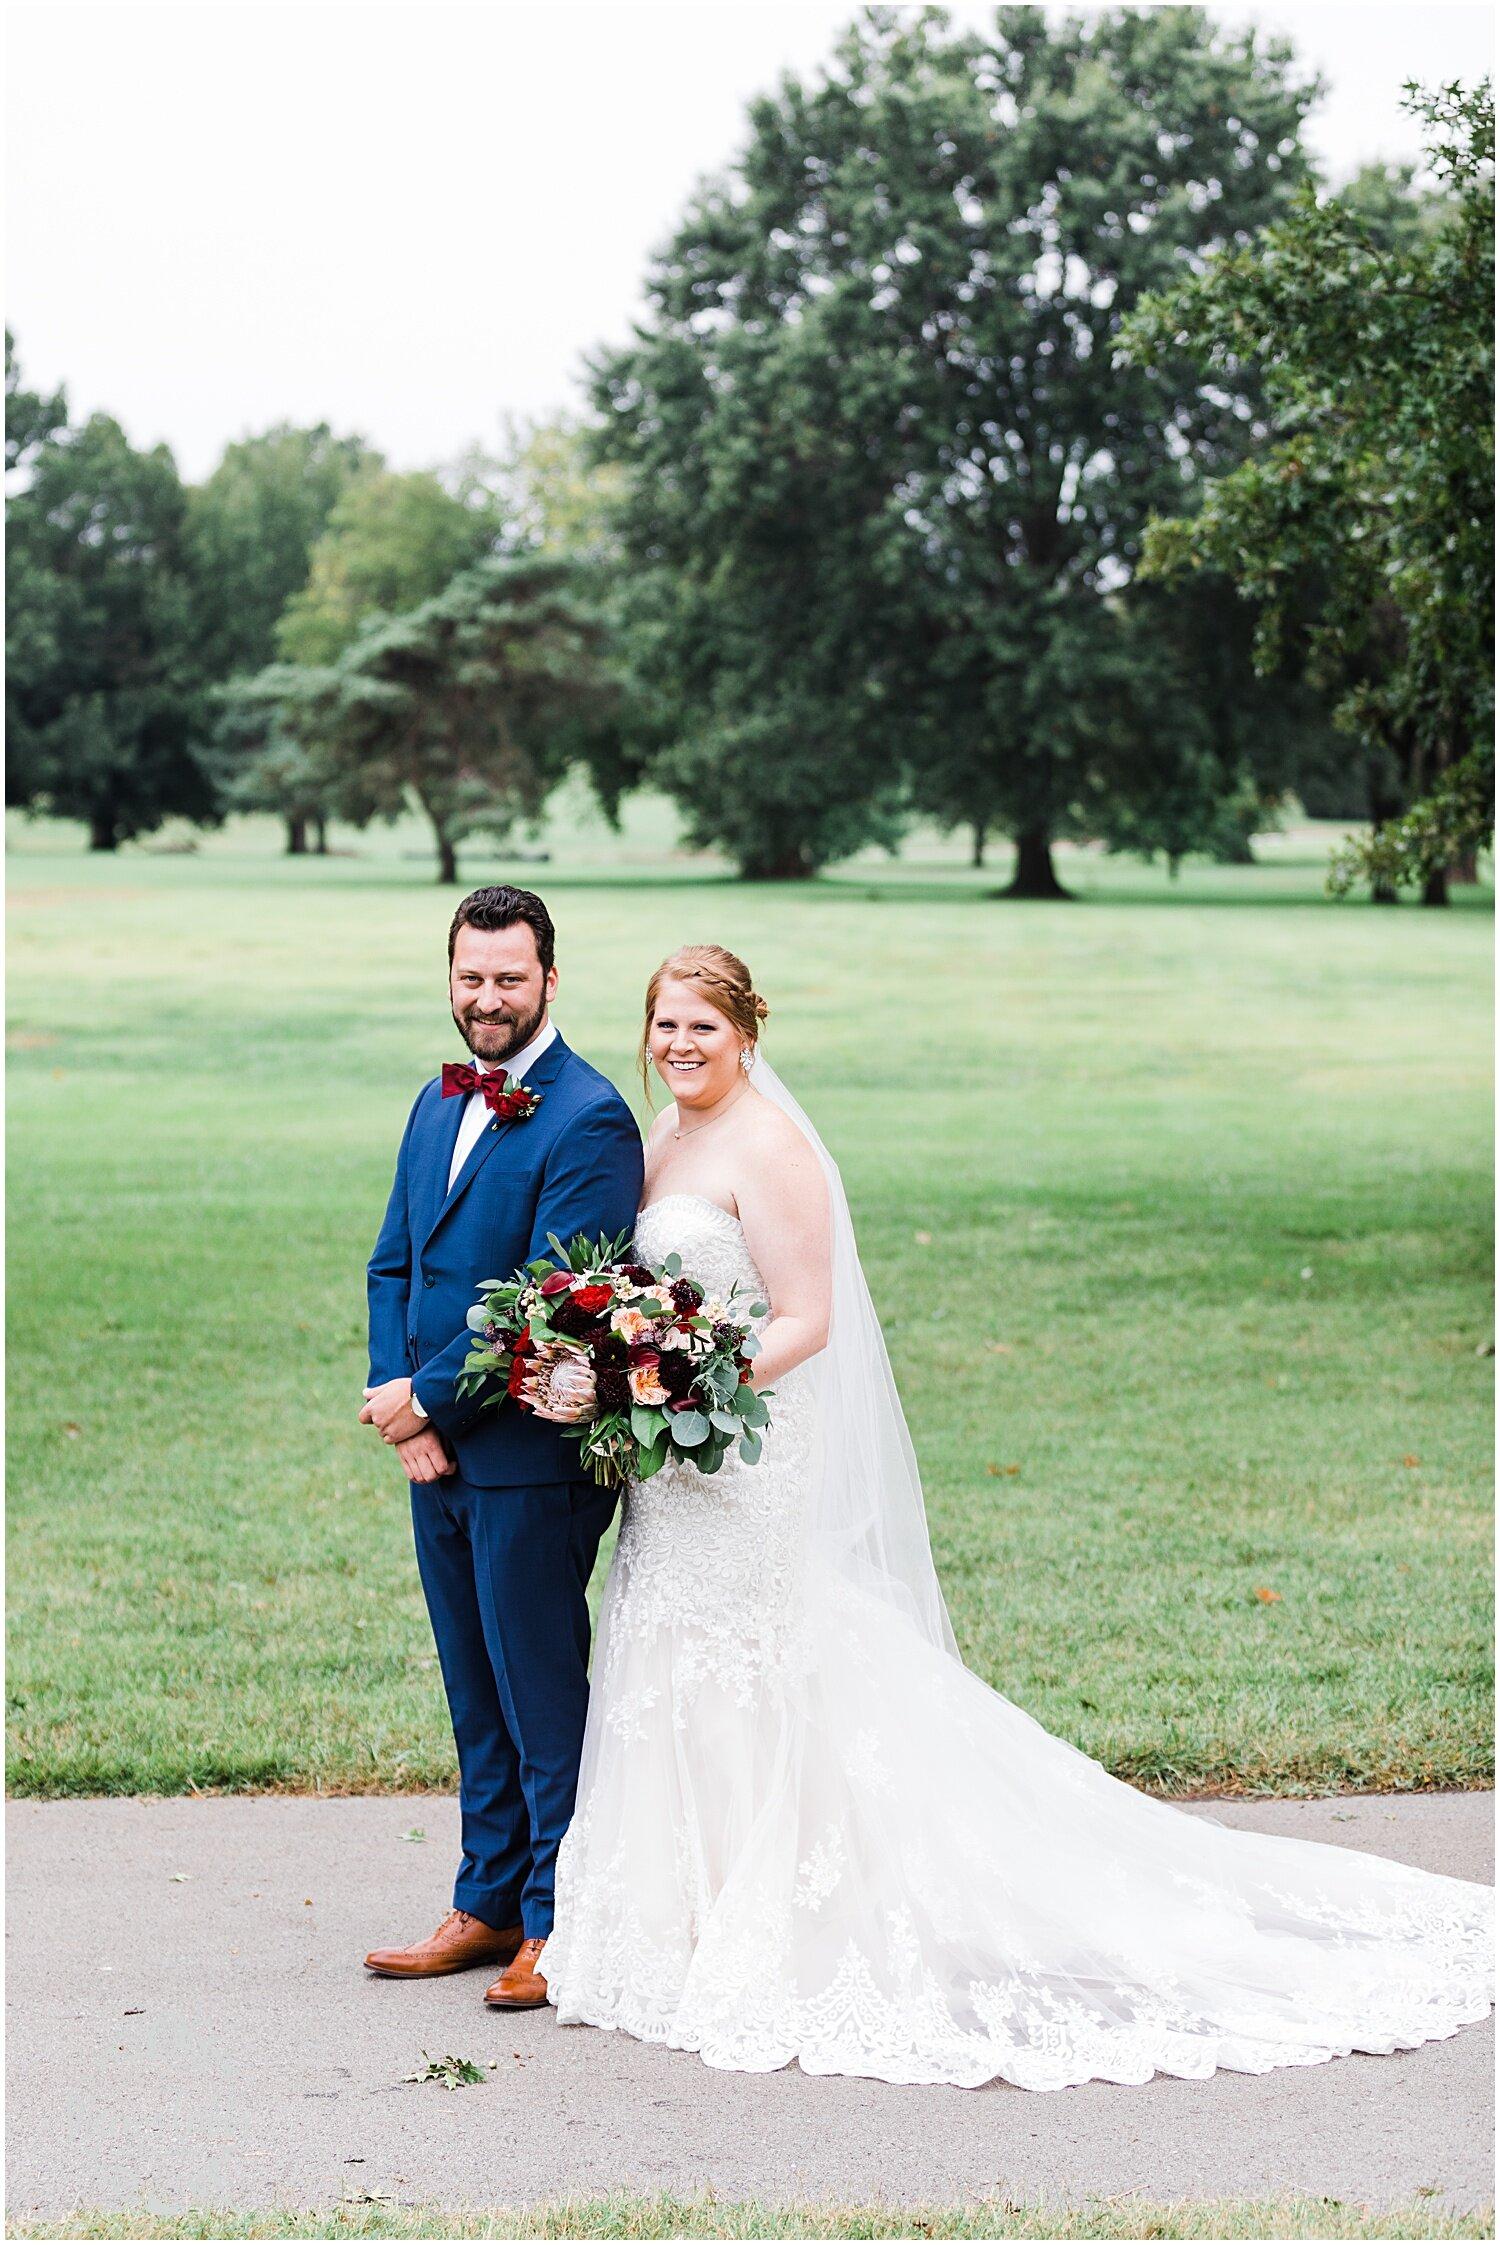 ANNA & LUKE MARRIED BLOG | MARISSA CRIBBS PHOTOGRAPHY | WESTON RED BARN FARM_9371.jpg